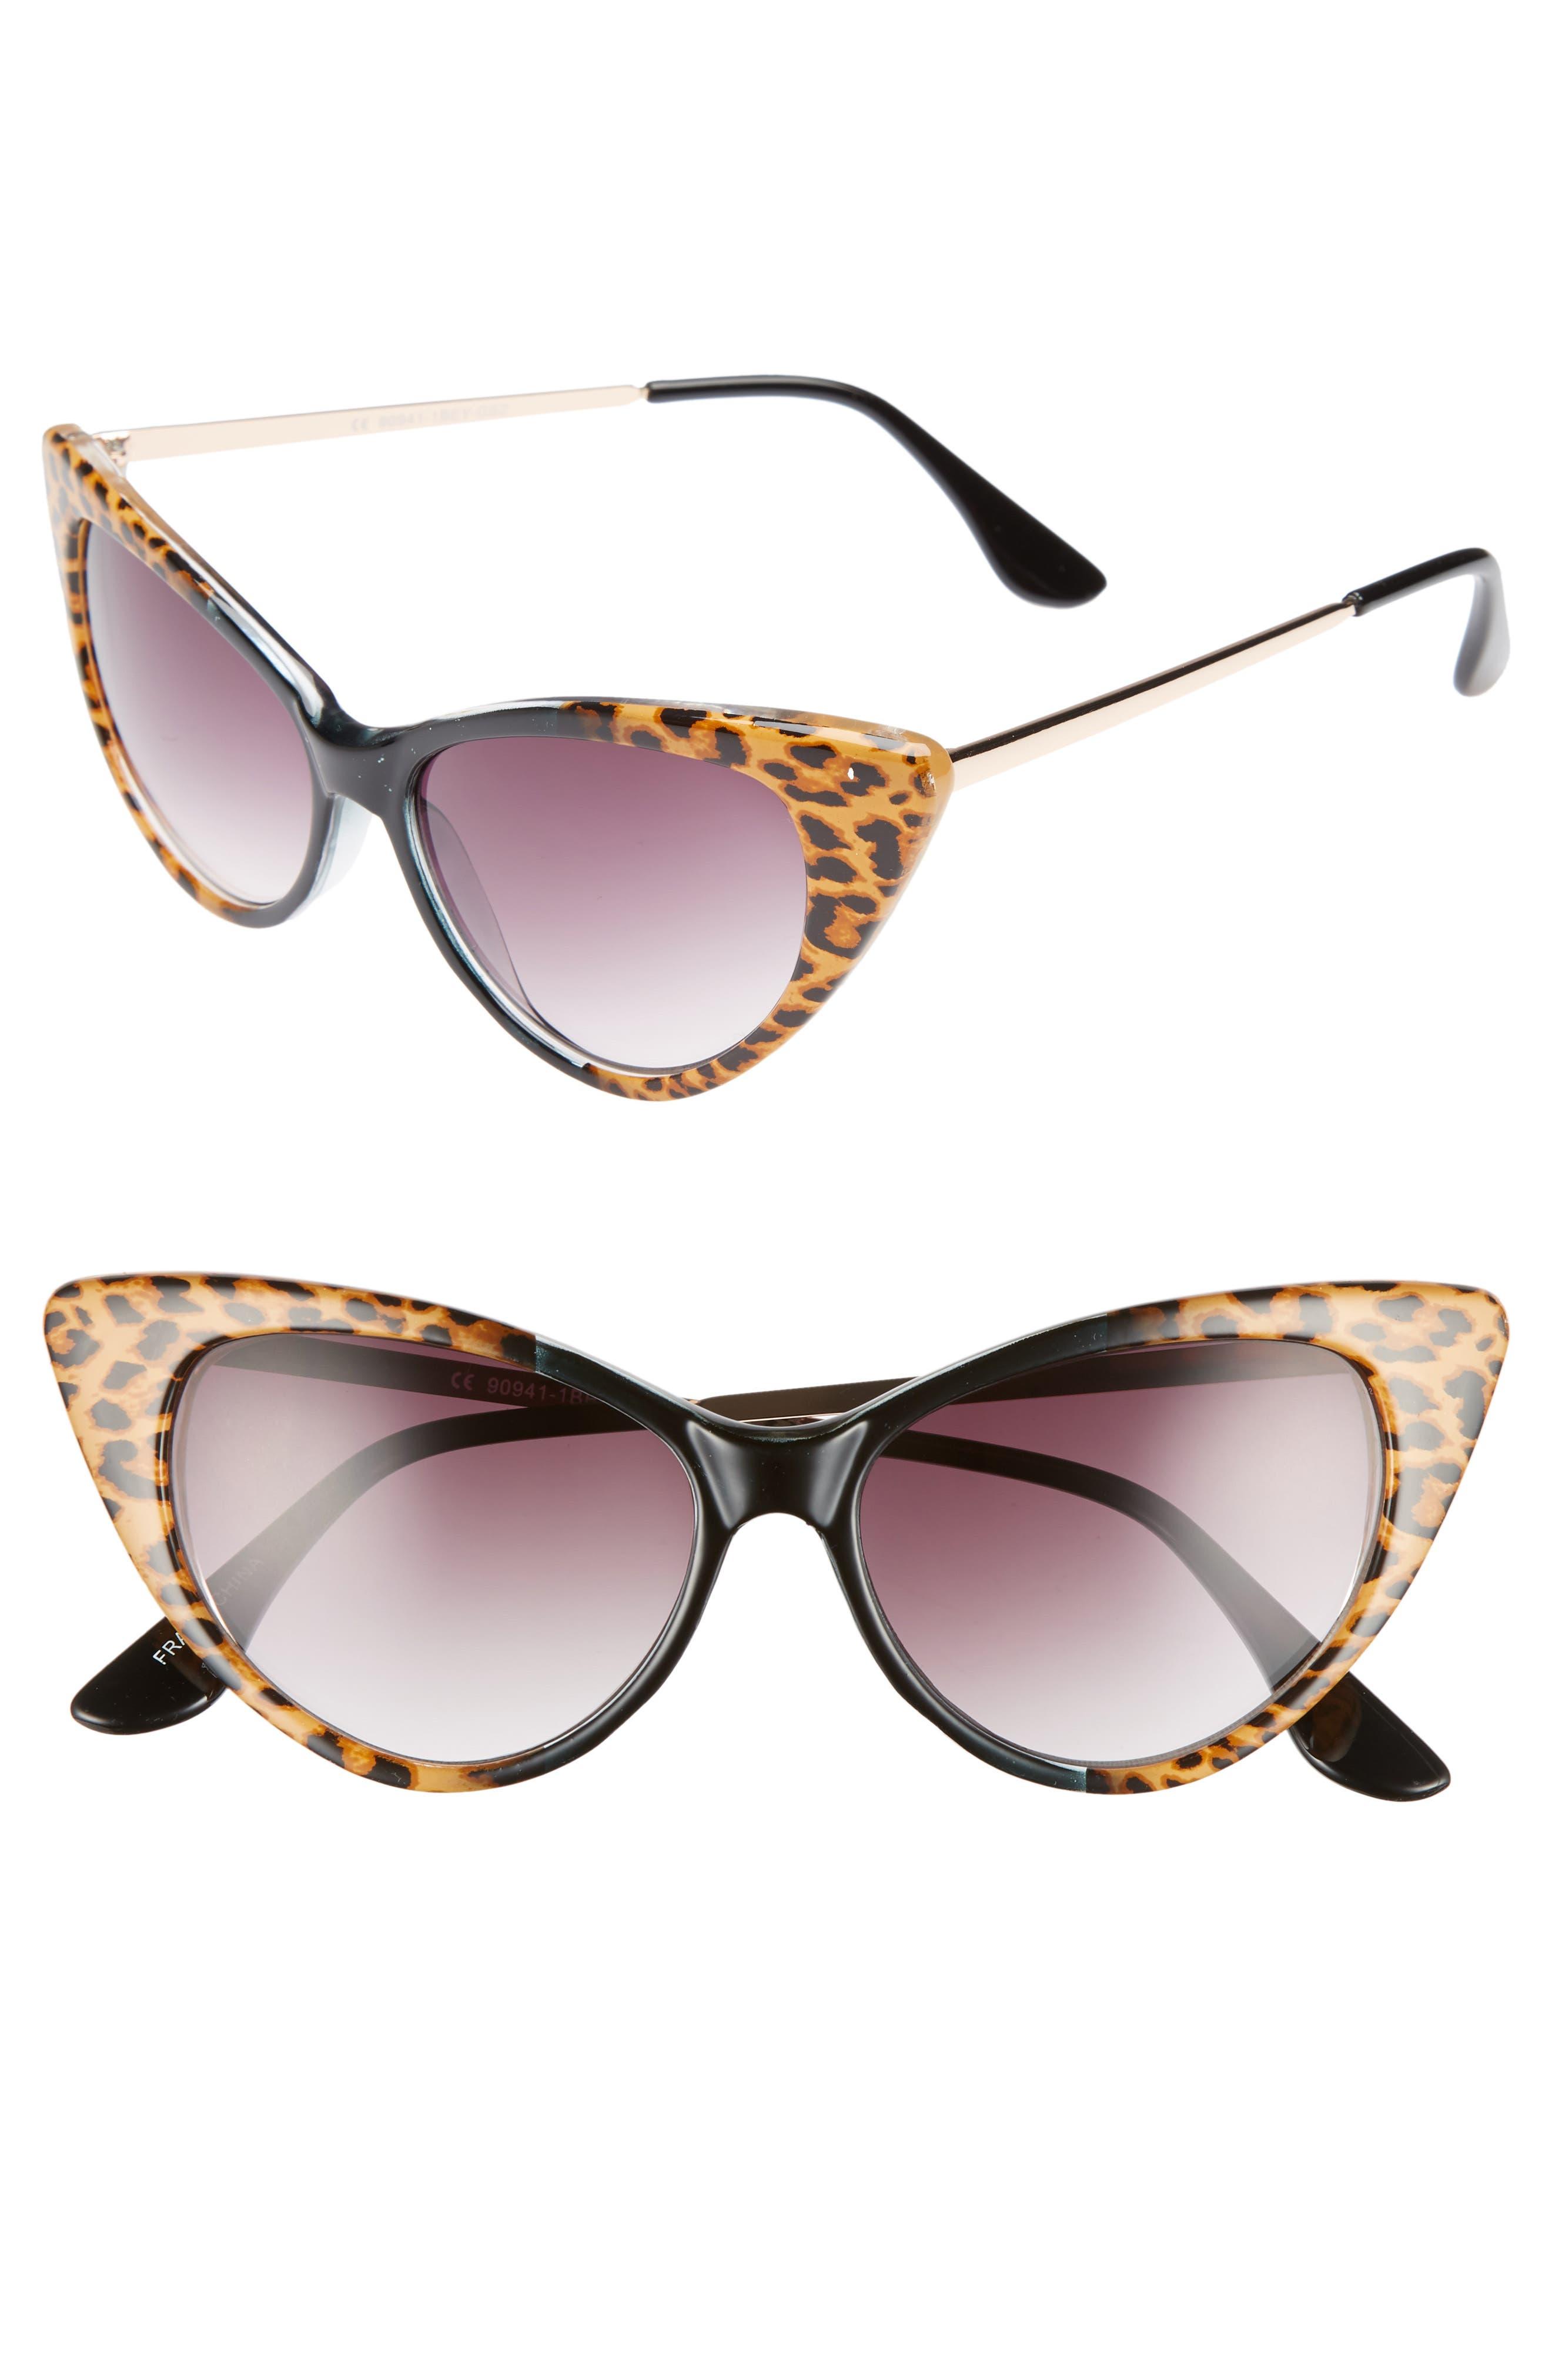 62mm Leopard Print Cat Eye Sunglasses,                             Main thumbnail 1, color,                             Leopard/ Black